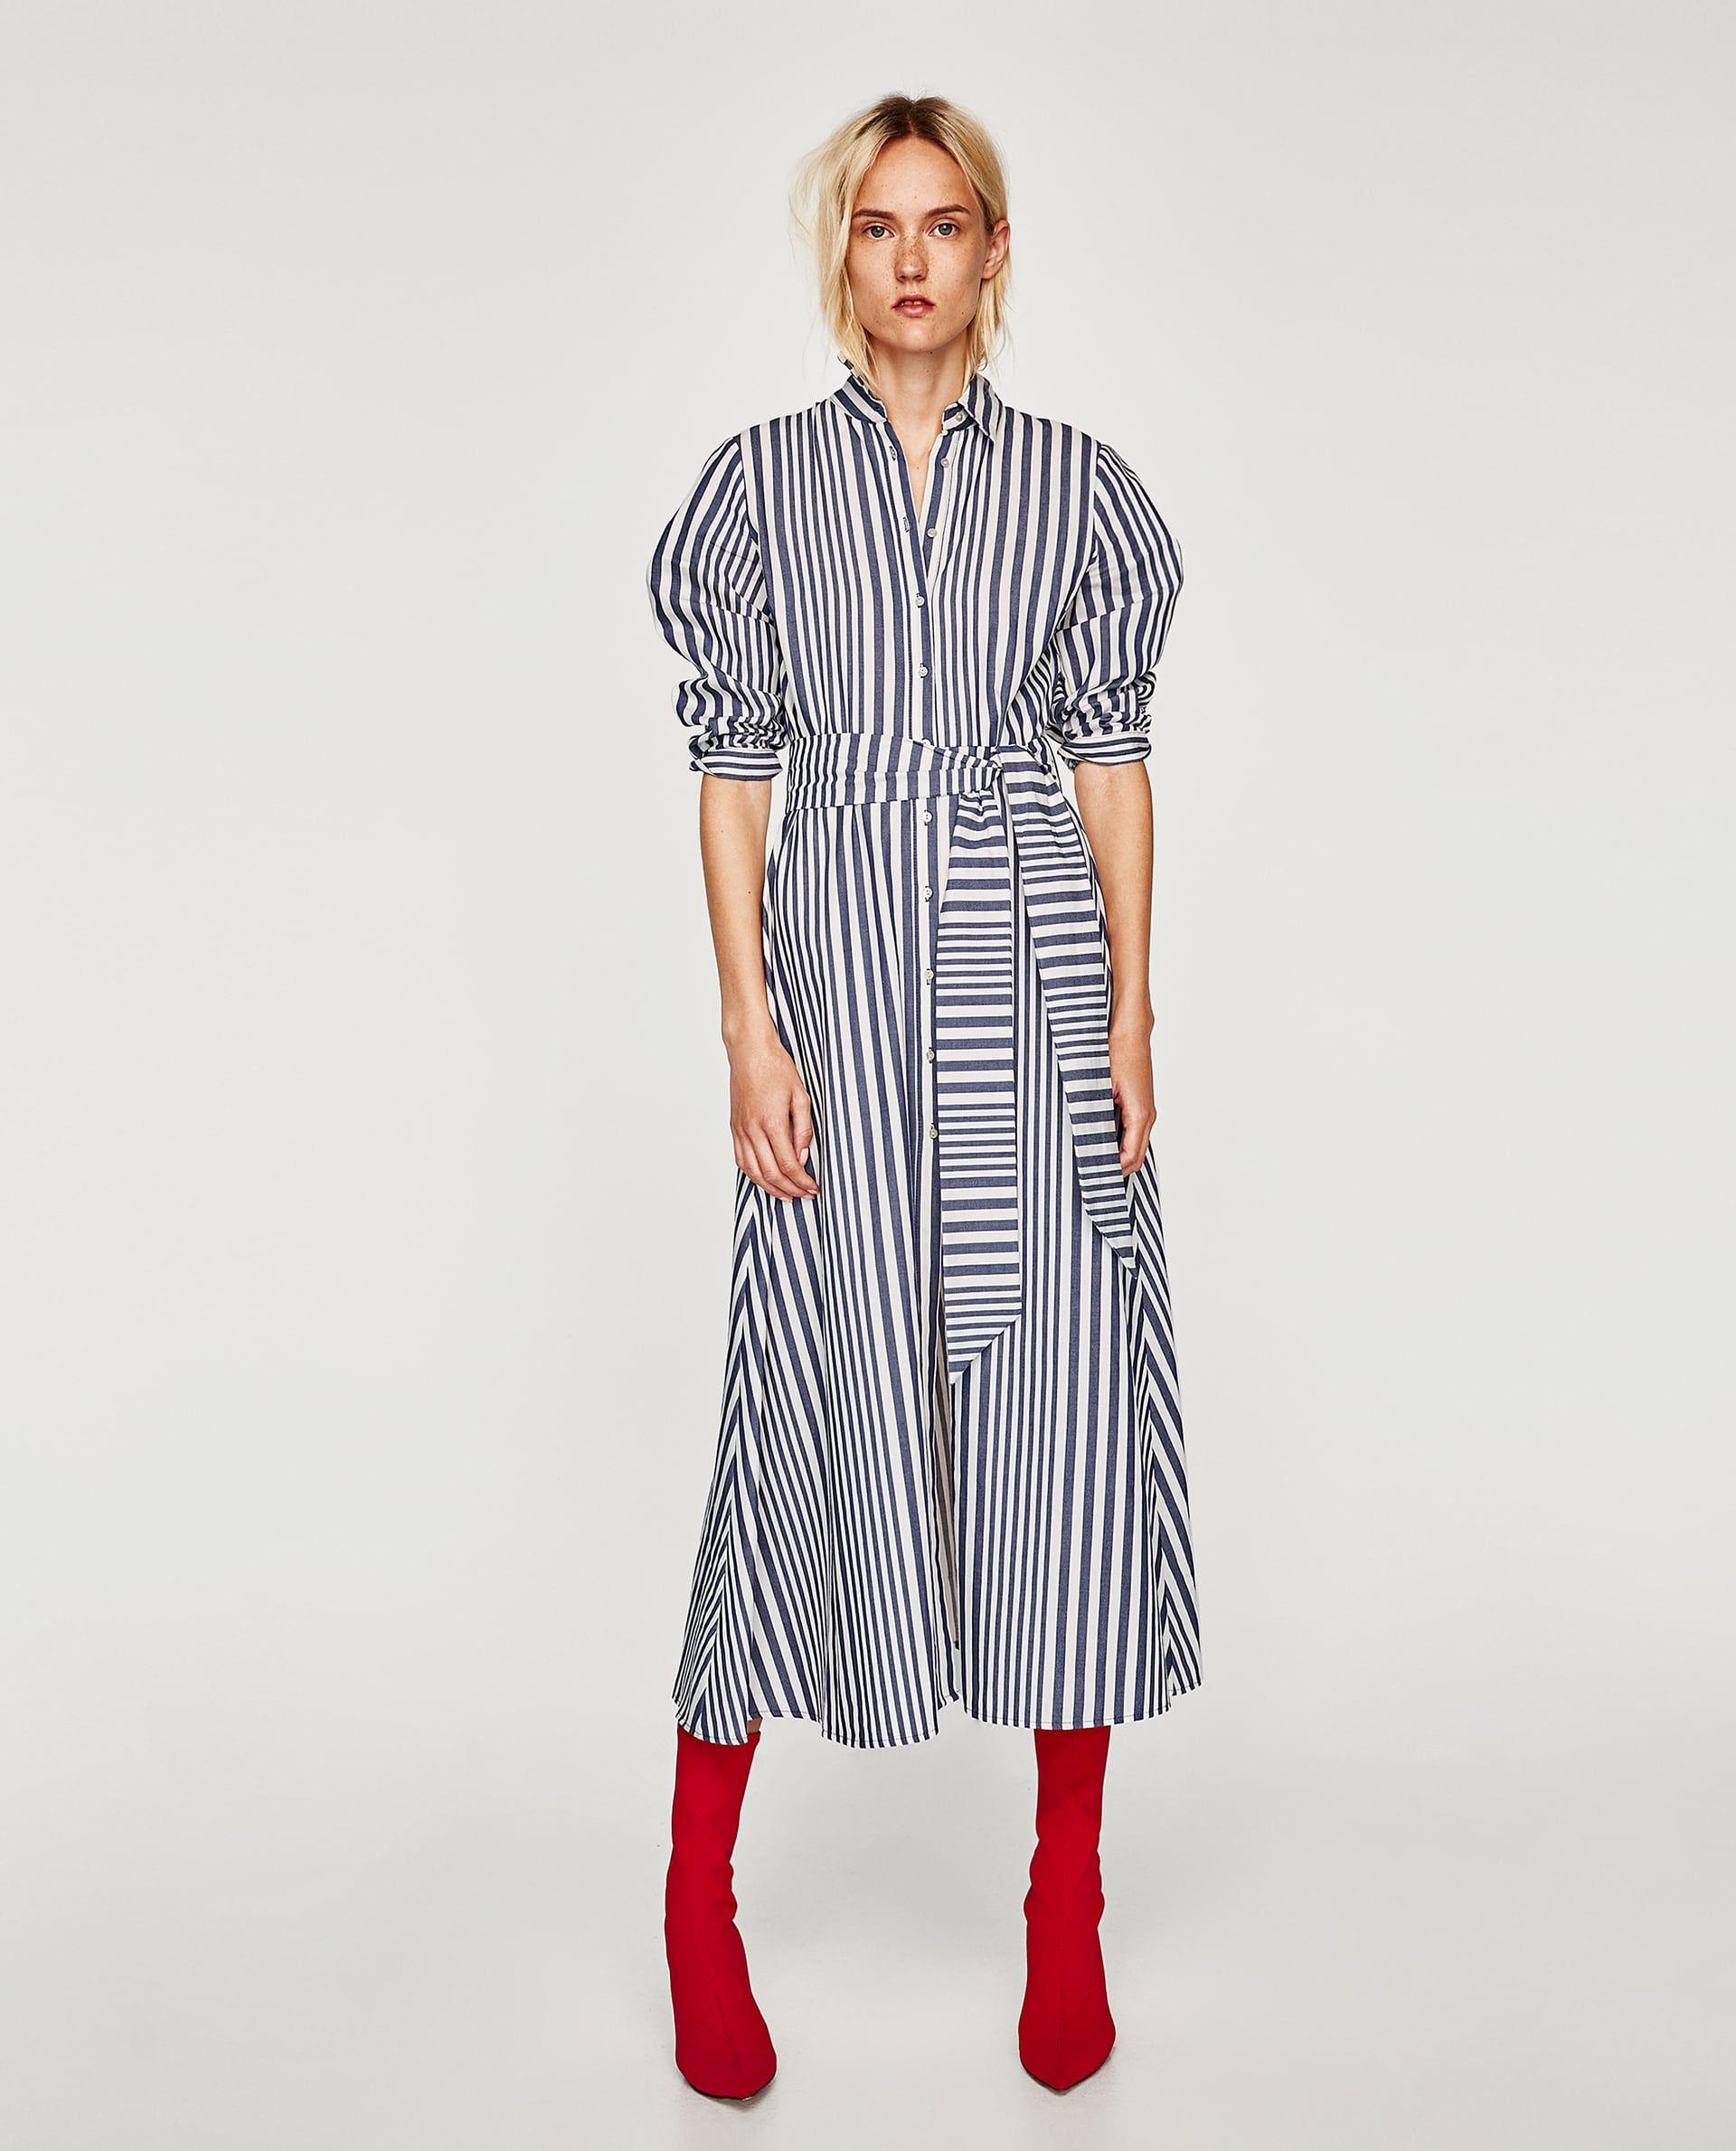 ZARA MAXIKLEID HEMDKLEID TUNIKA STREIFEN GÜRTEL LONG STRIPED BELTED DRESS TUNIC